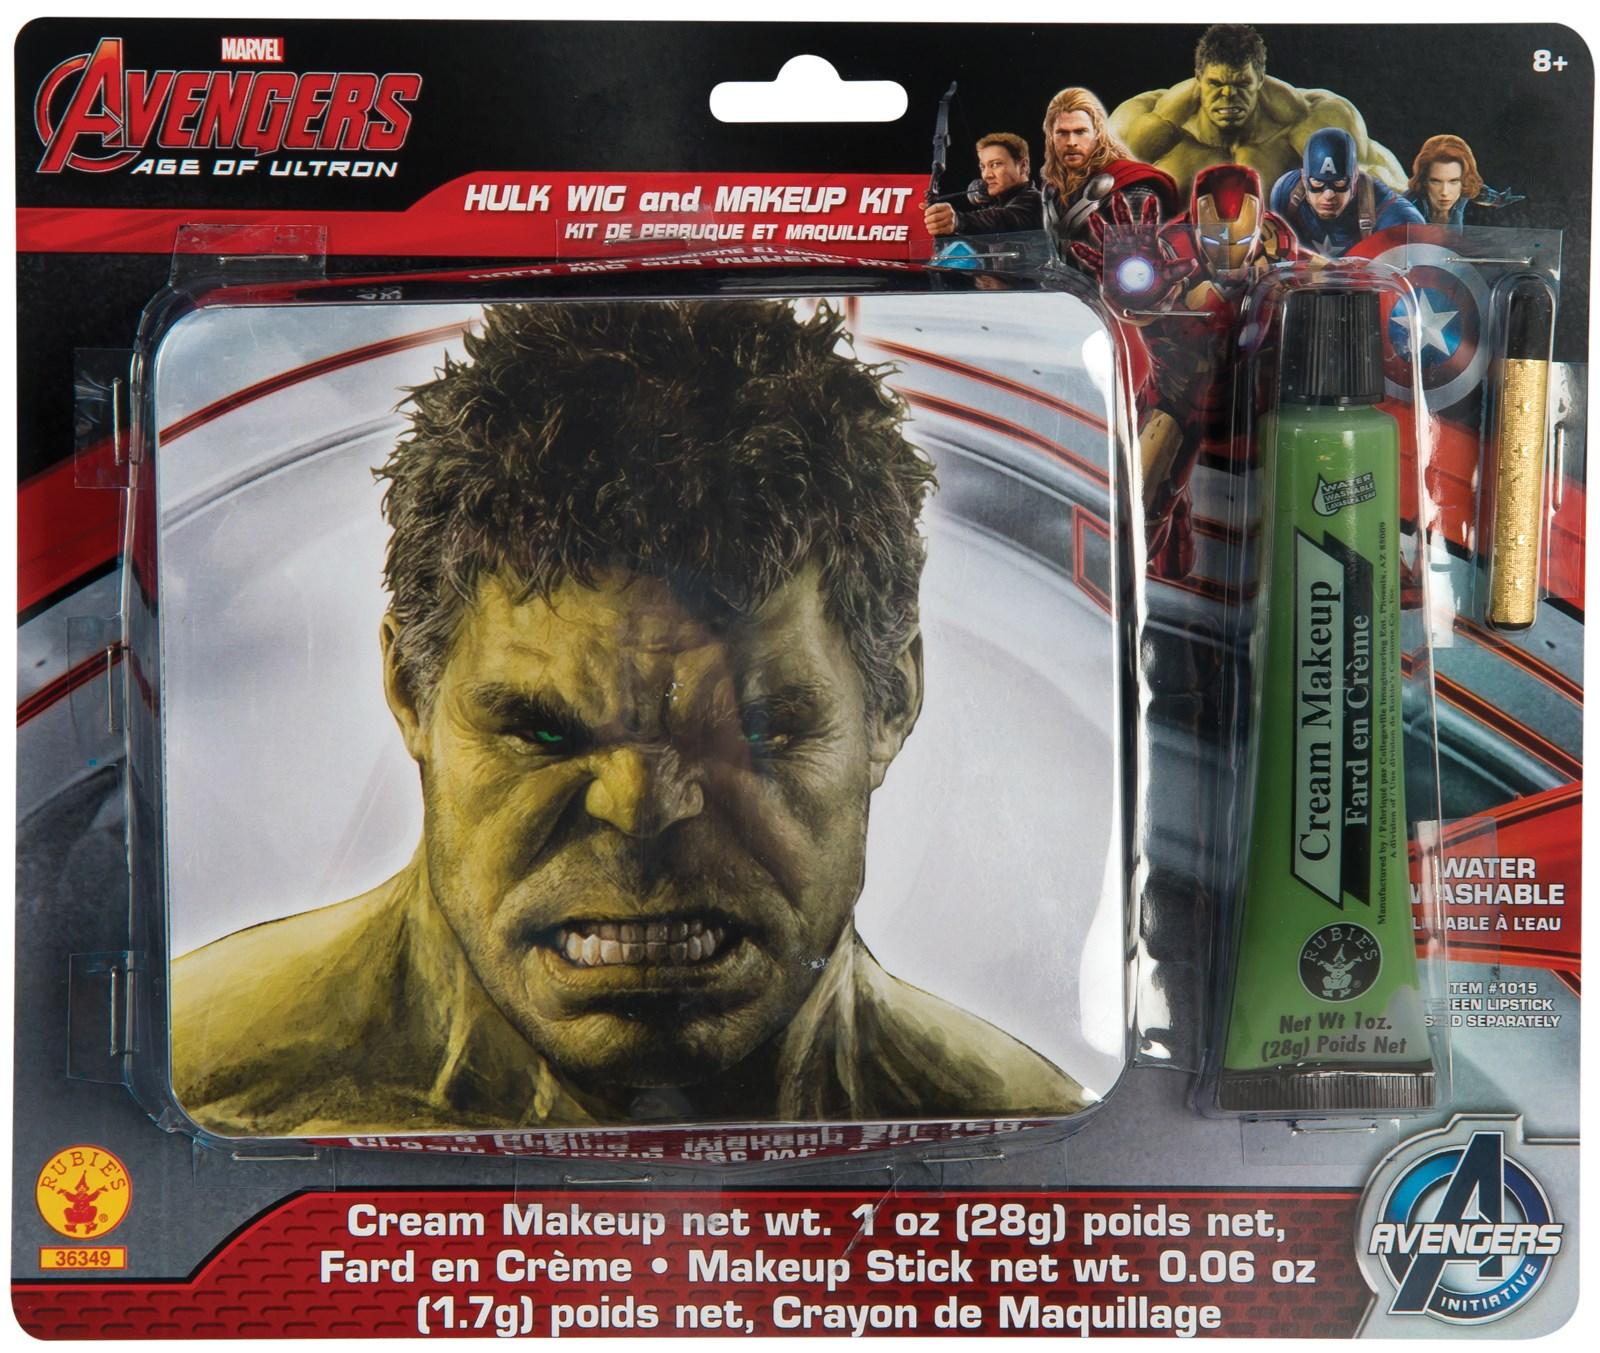 Avengers 2 – Age of Ultron: The Hulk Costume Makeup Kit